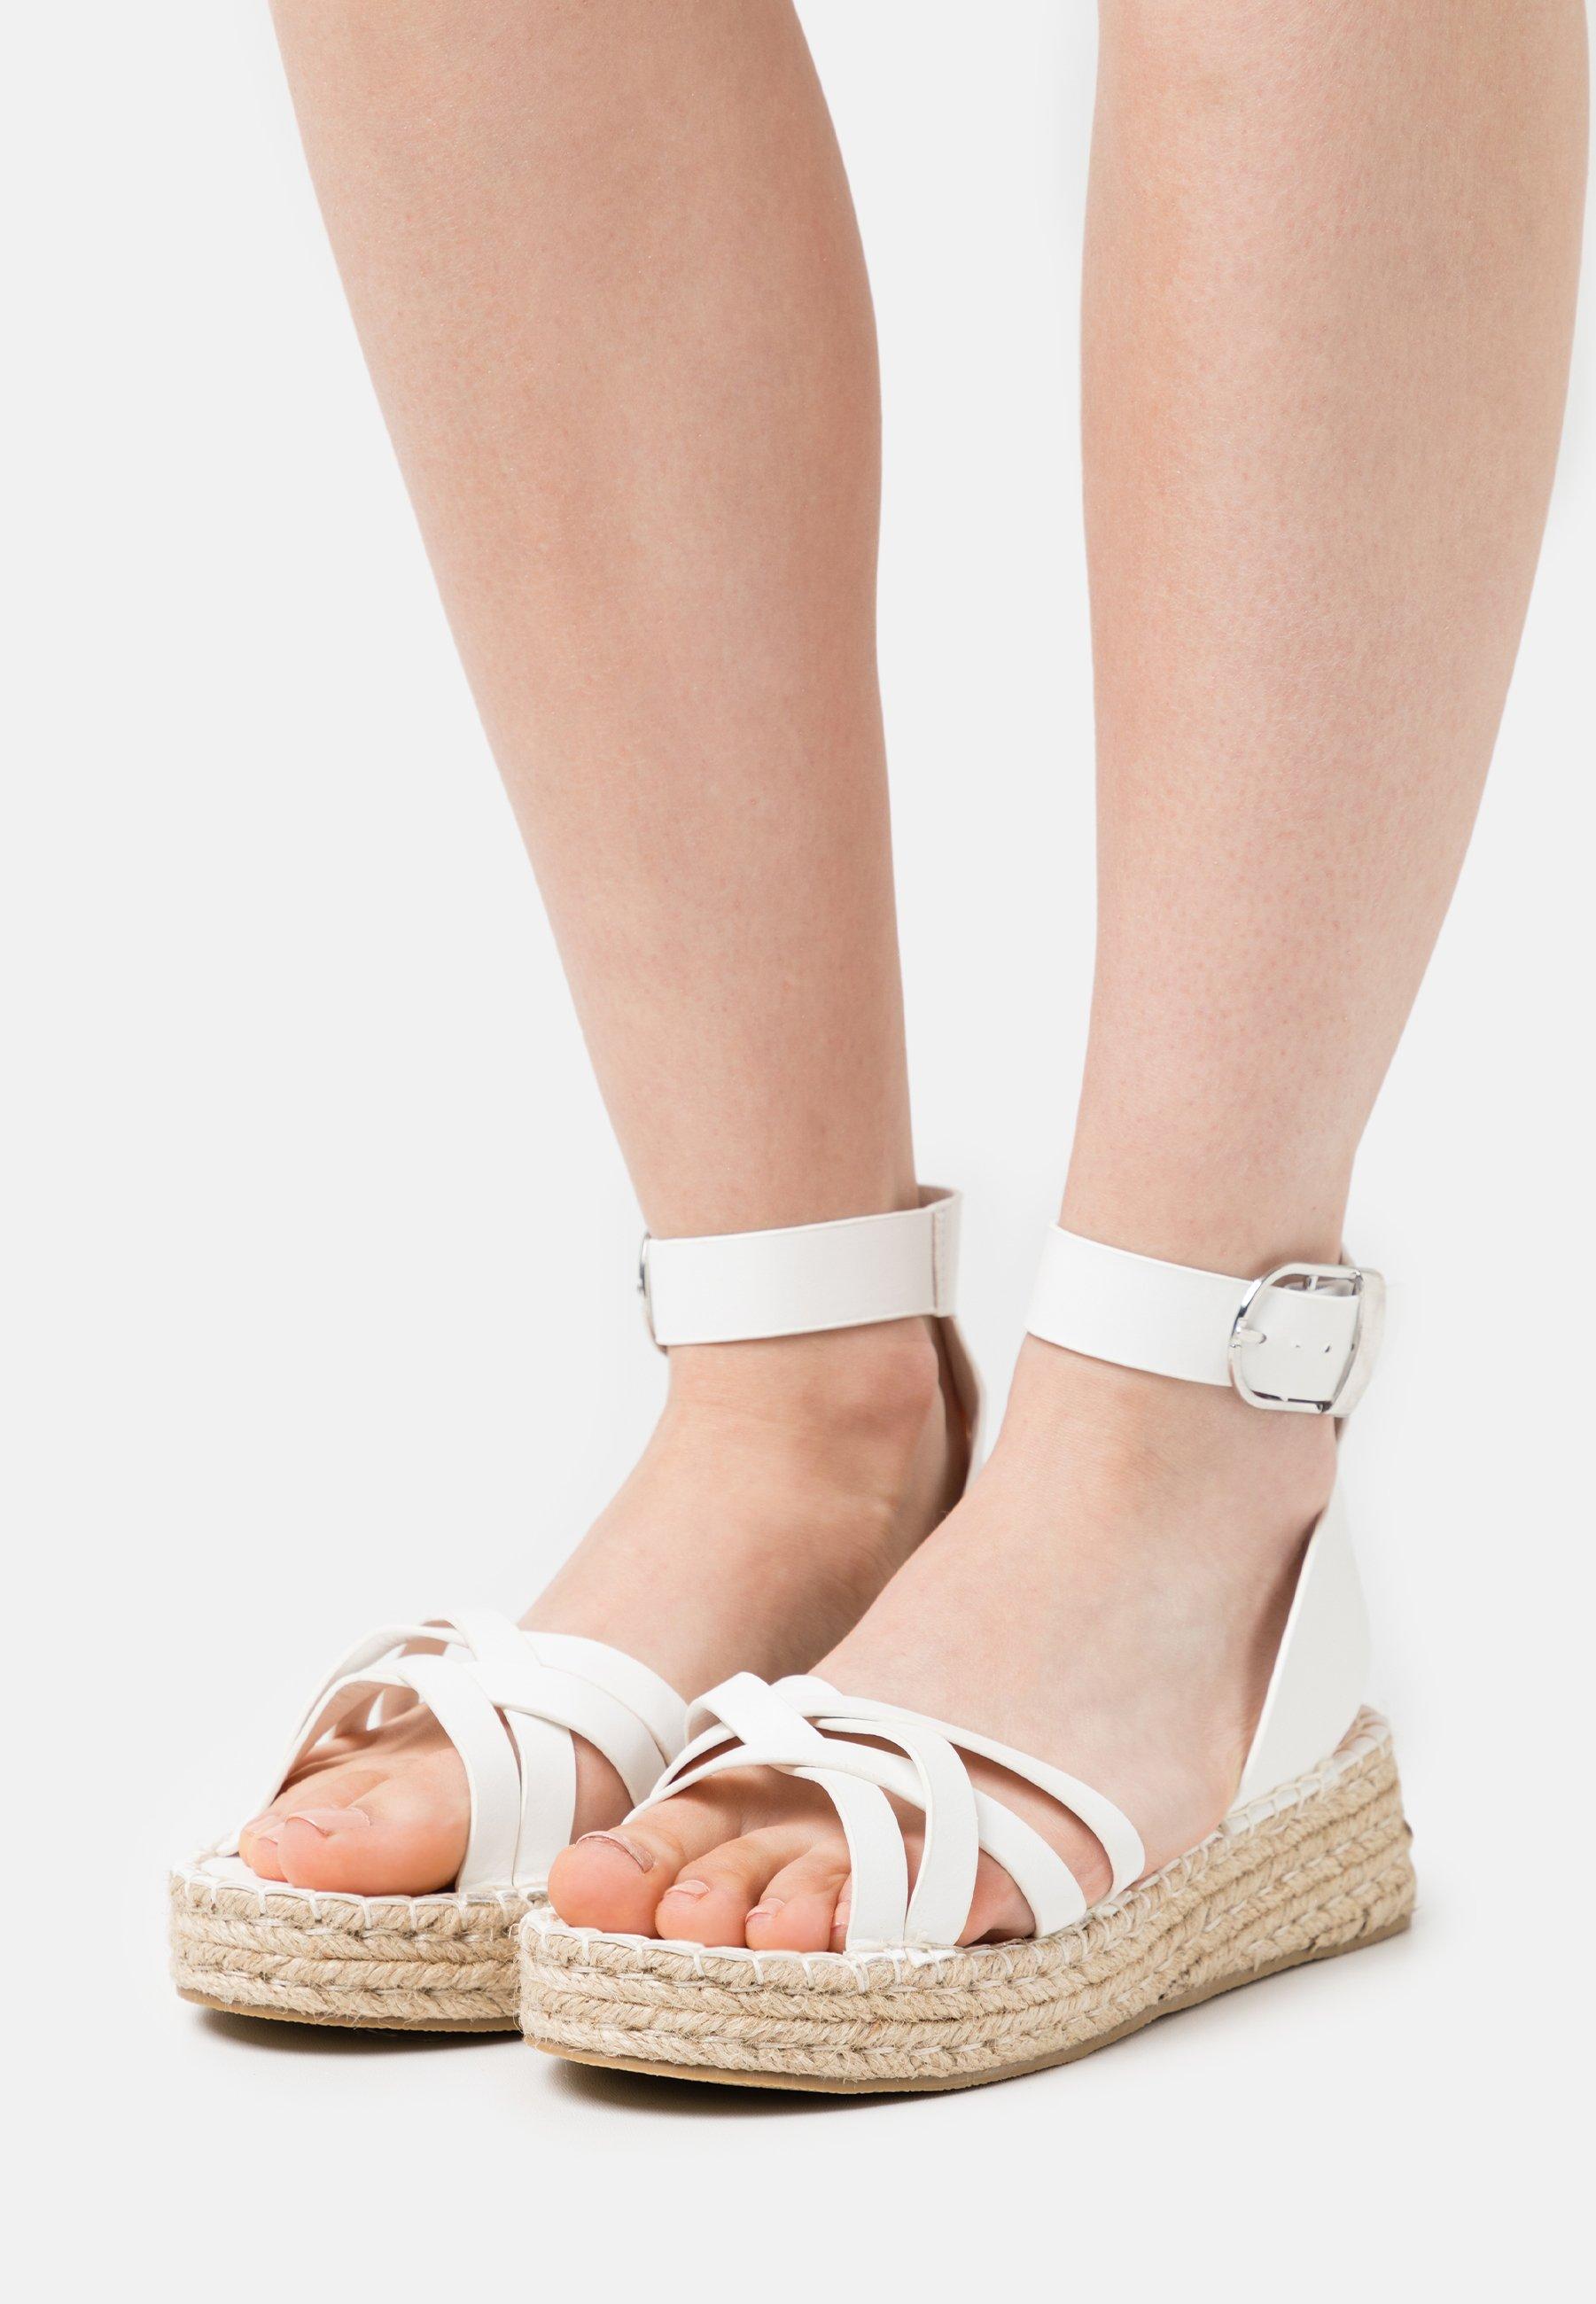 Women 2 PART WITH MUTLI CROSS OVER STRAPS - Platform sandals